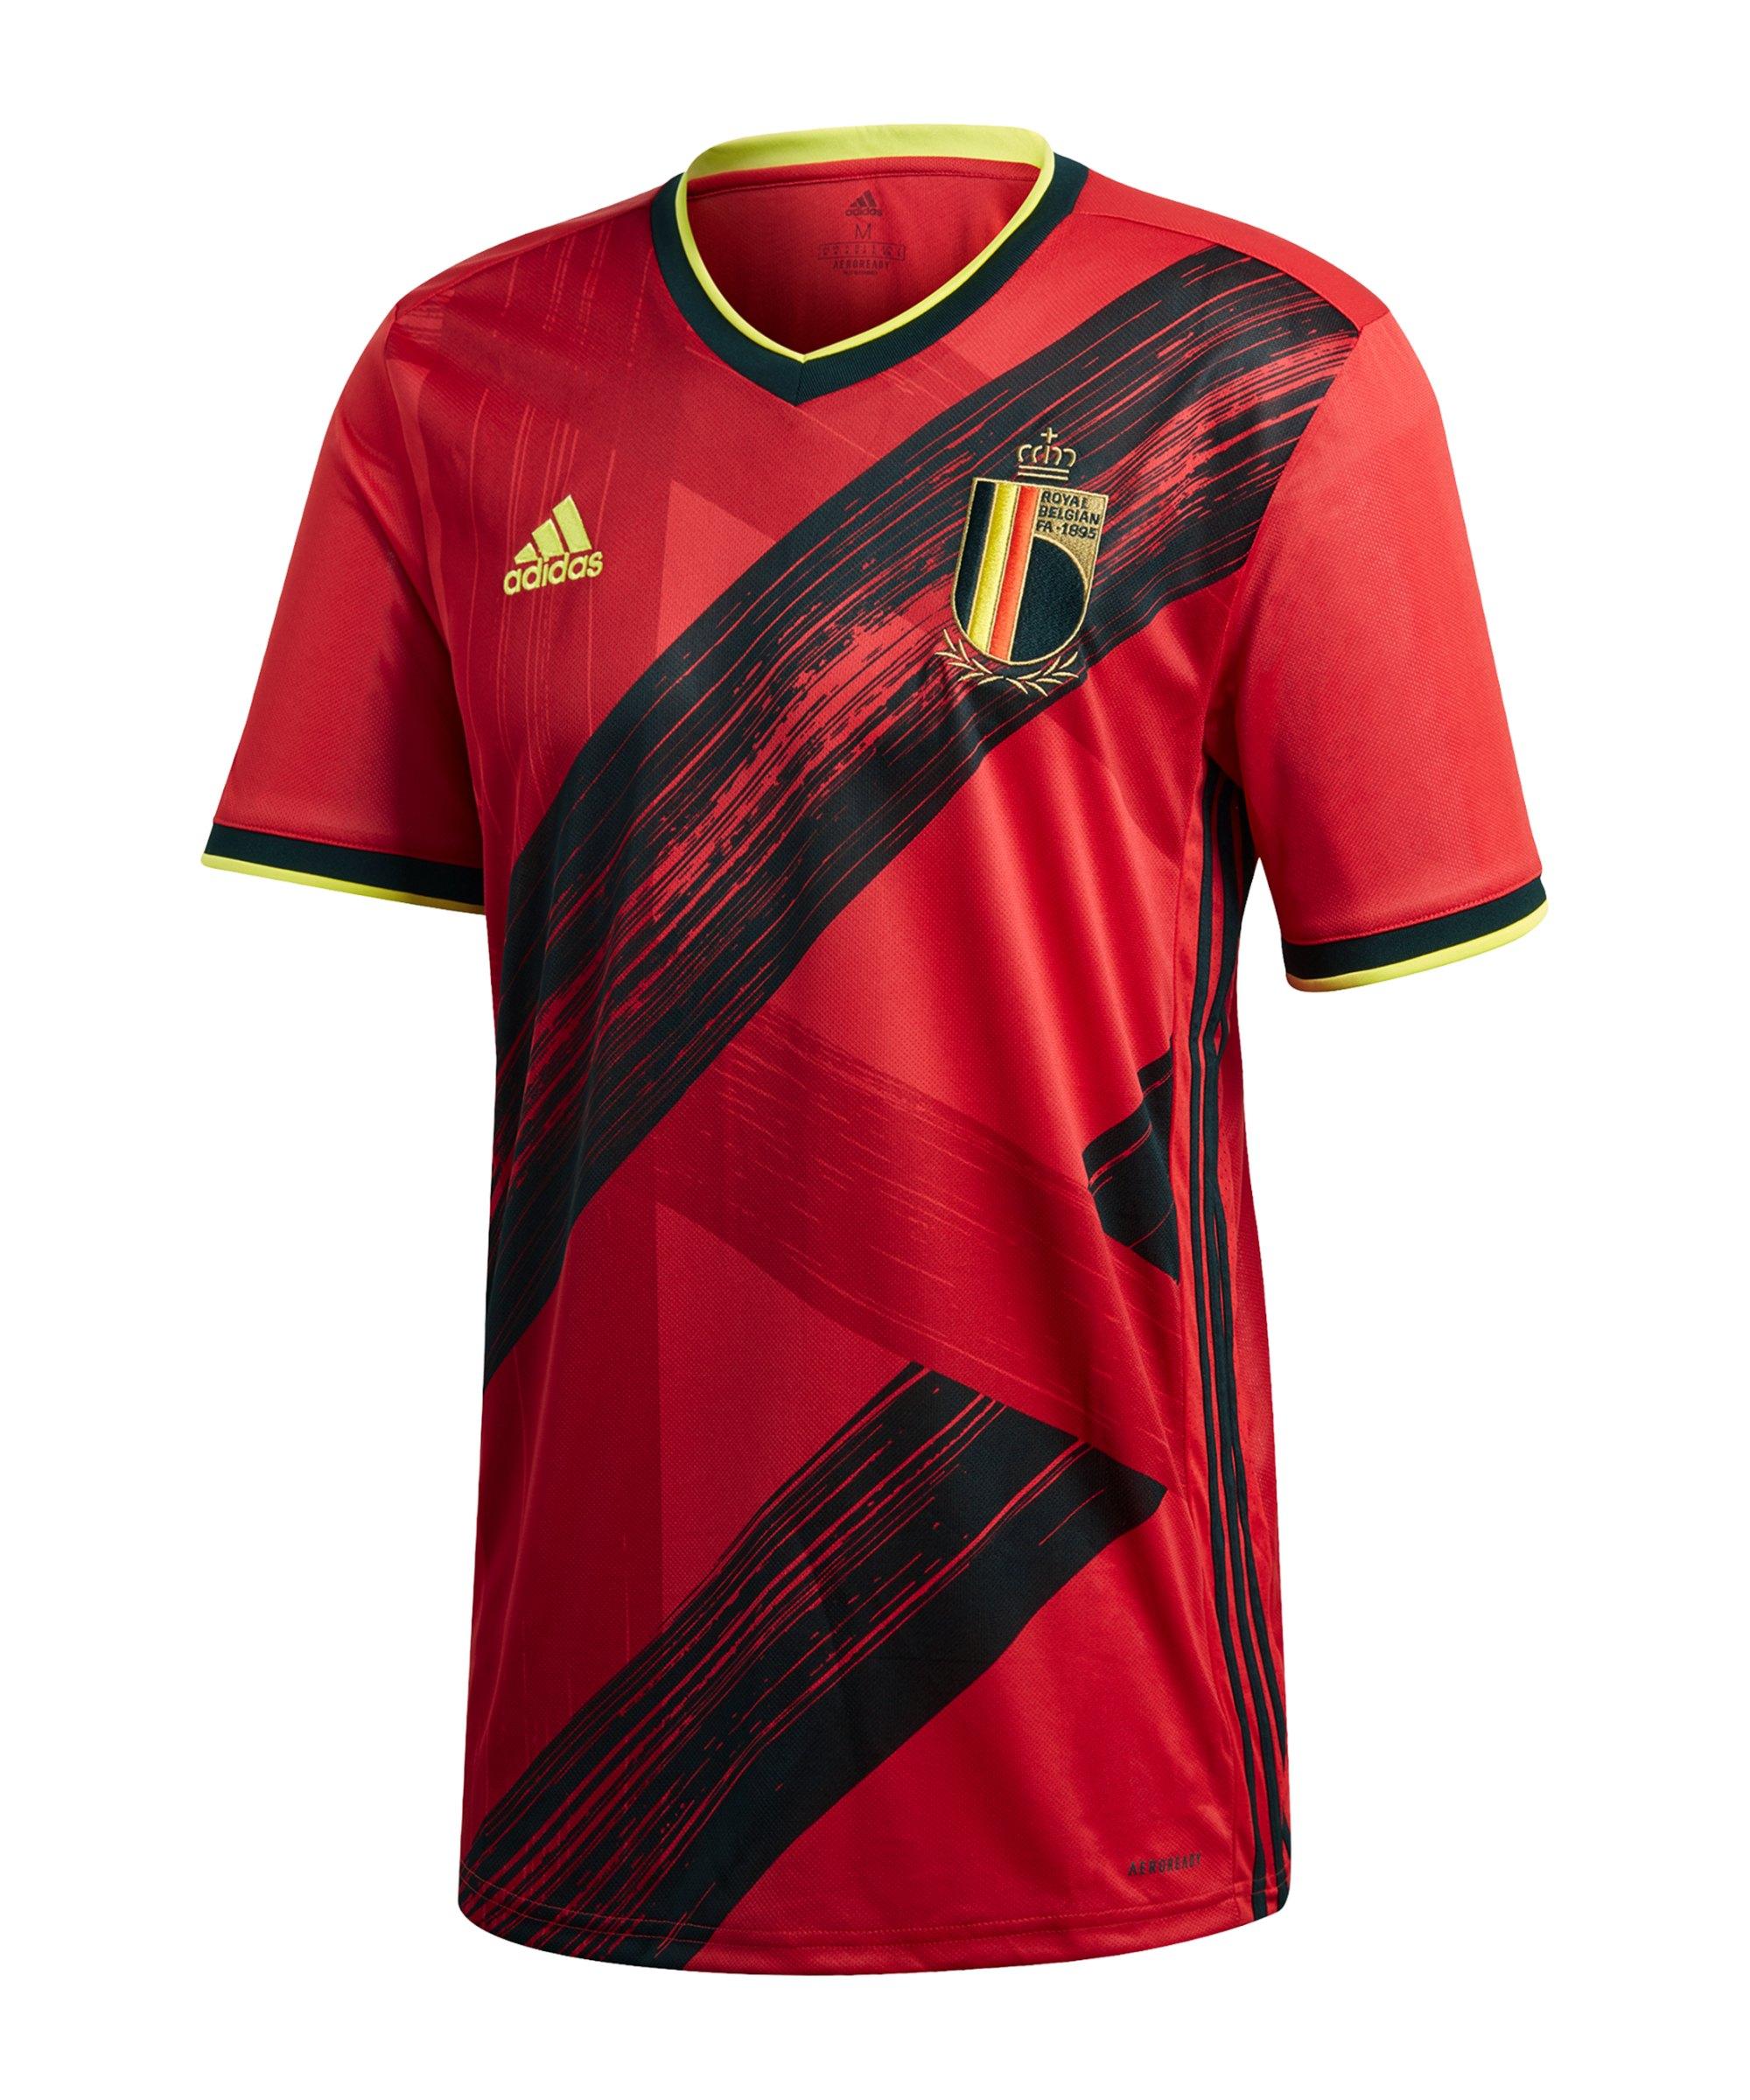 adidas Belgien Trikot Home EM 2020 Rot - rot